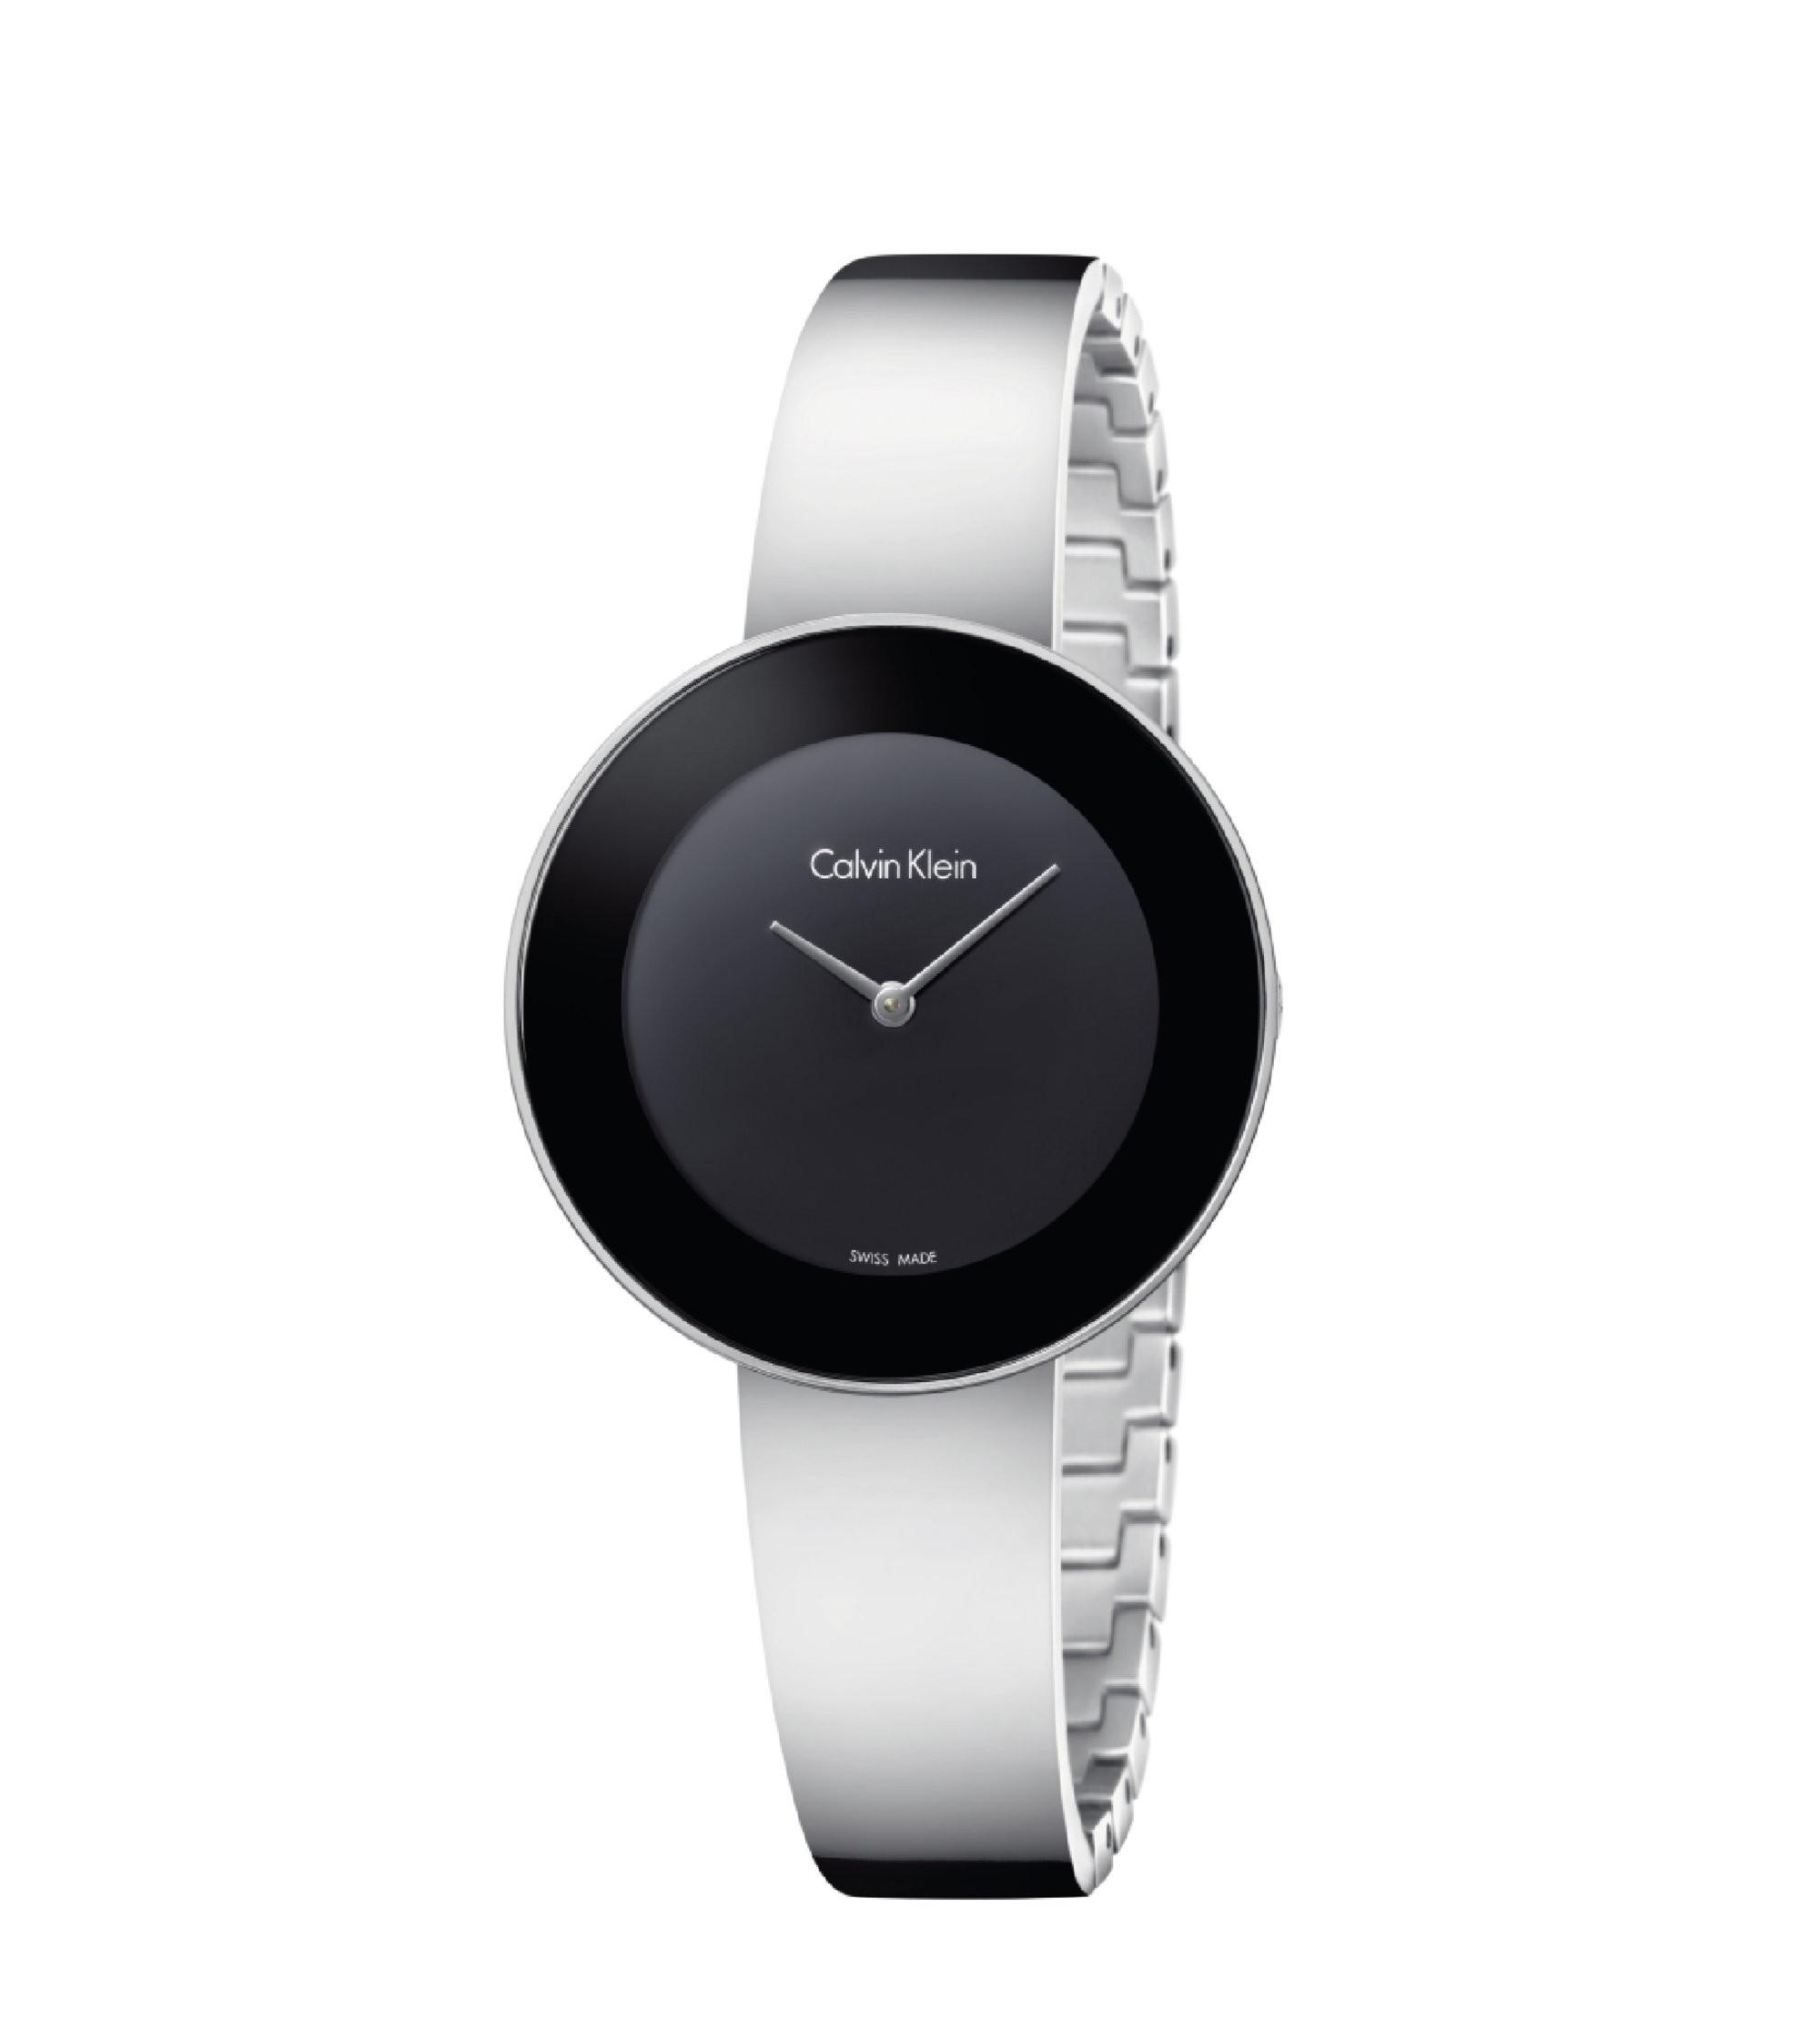 6ecd0271b8fc Reloj Calvin Klein Mujer K7N23C41 RELOJES CALVIN KLEIN Ofertas